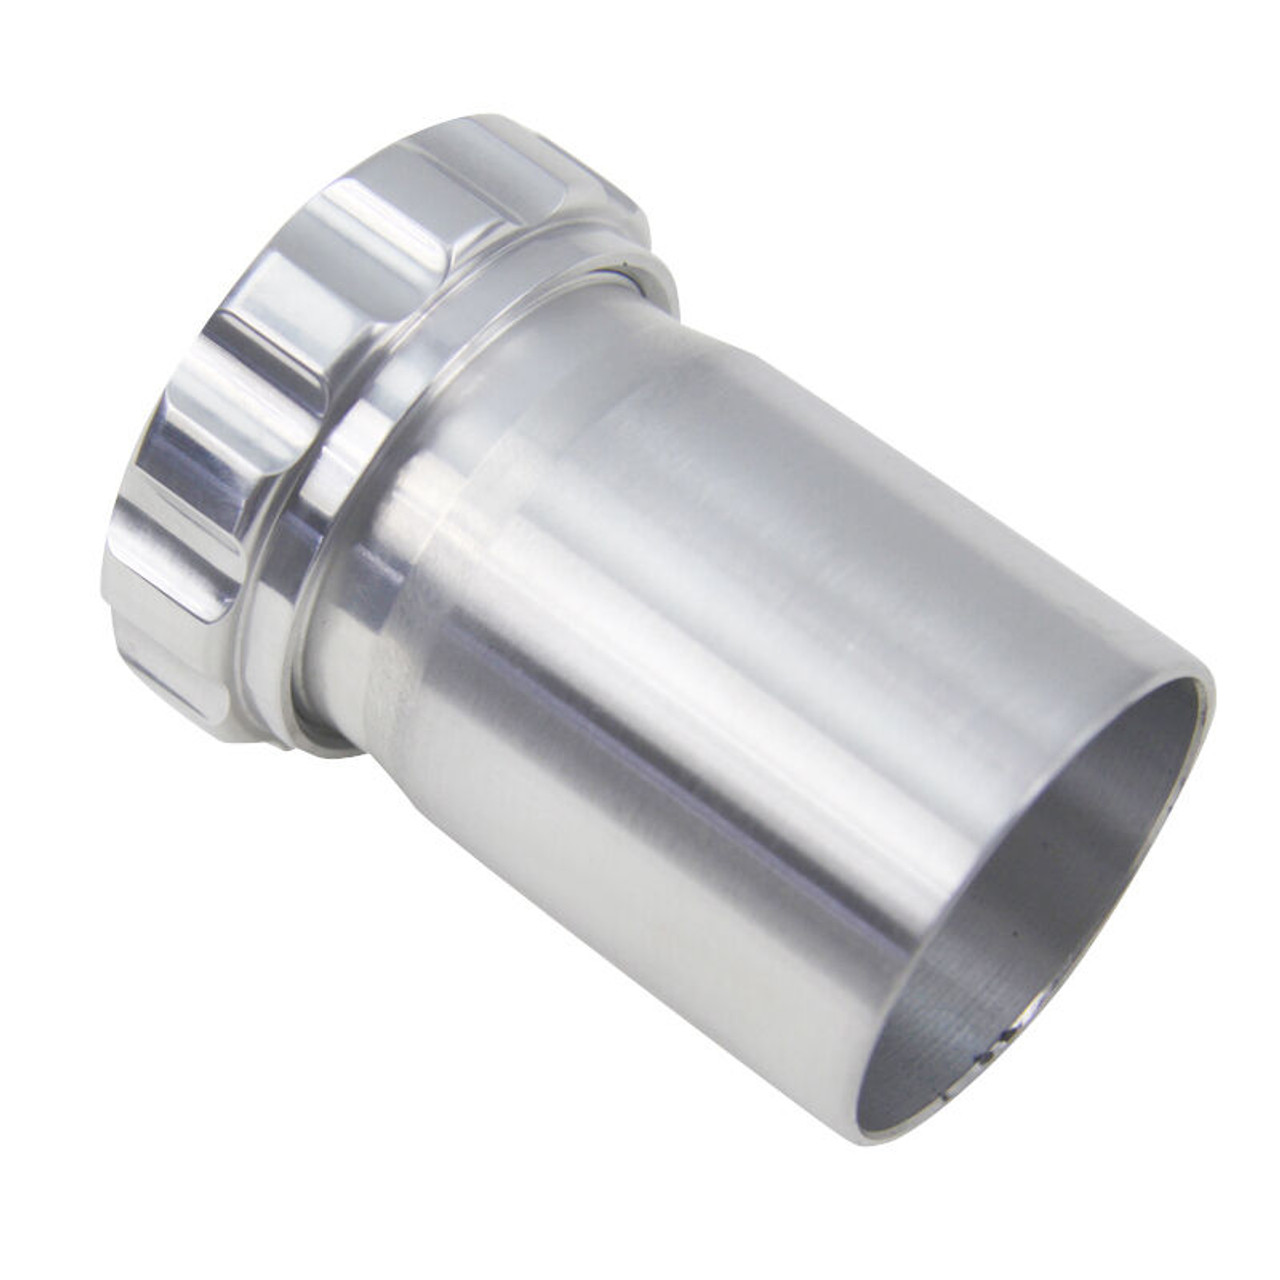 Weld On Cap For Billet Aluminum Gas / Diesel Fuel Tank 2